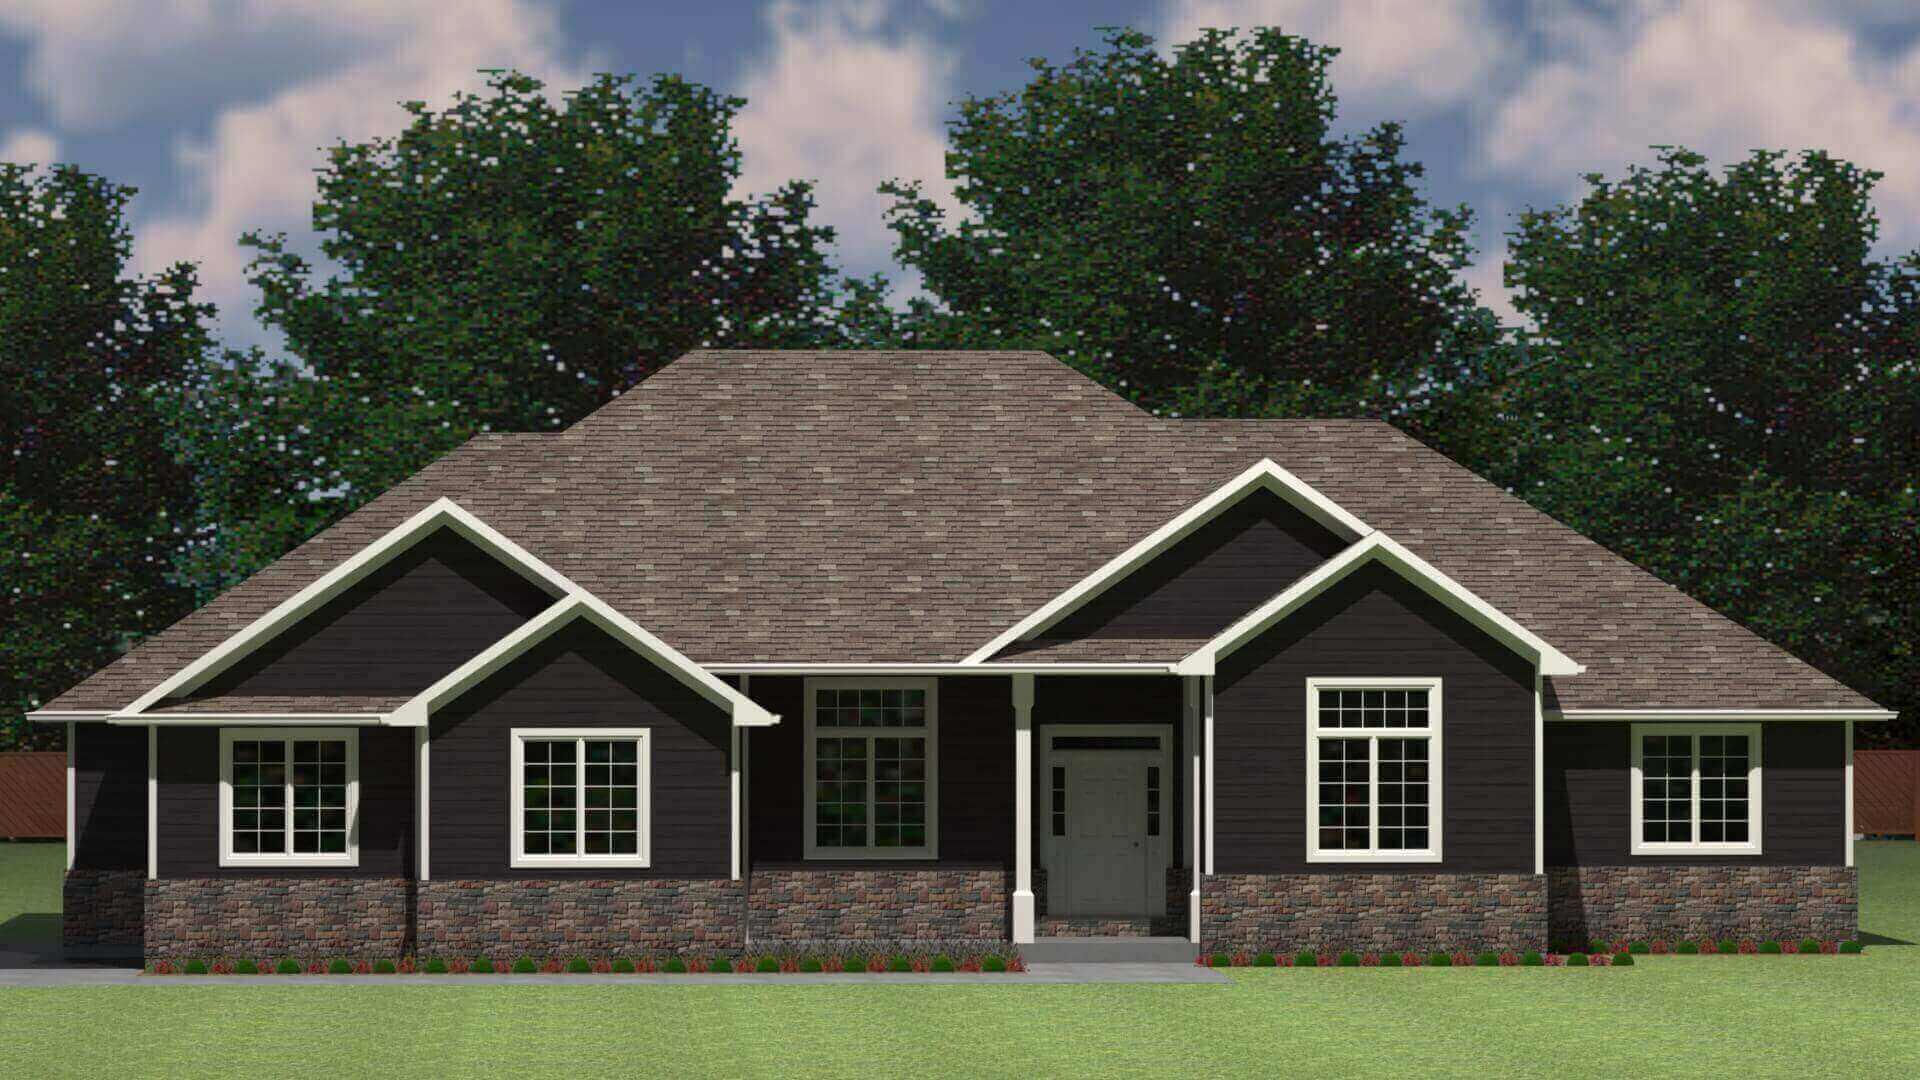 2324 house elevation